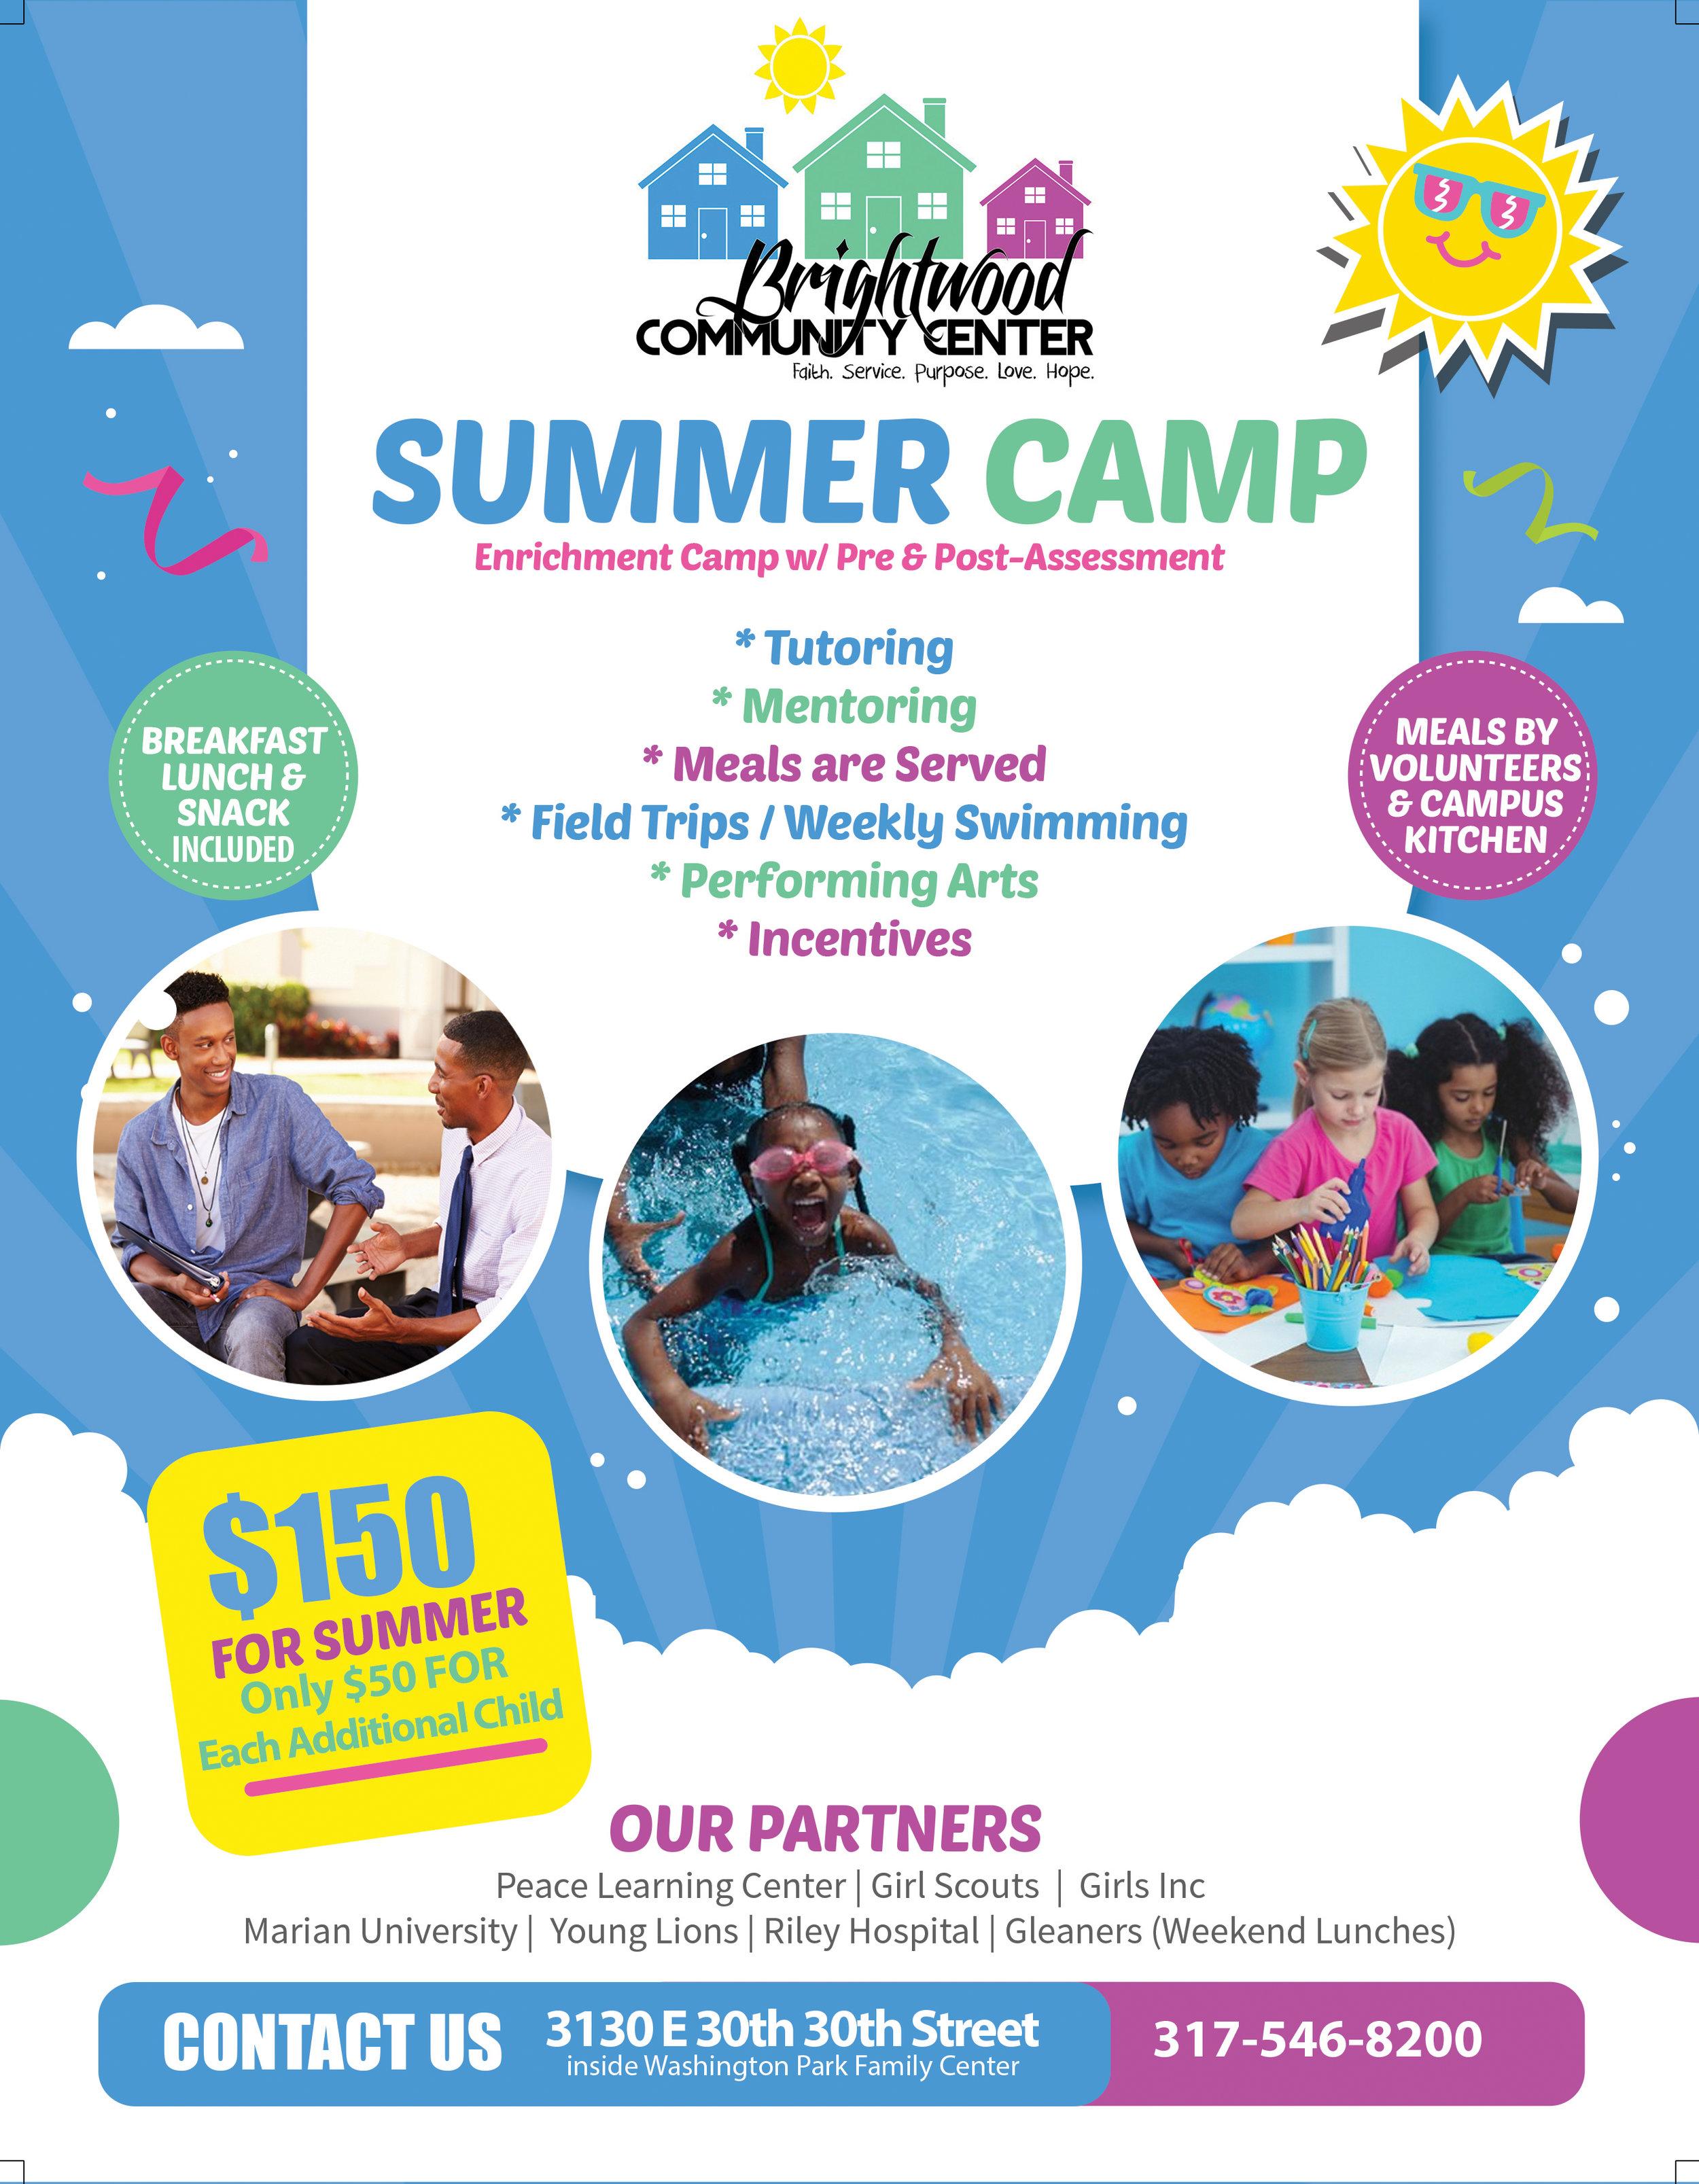 BrightWood_Summer_Camp.jpg